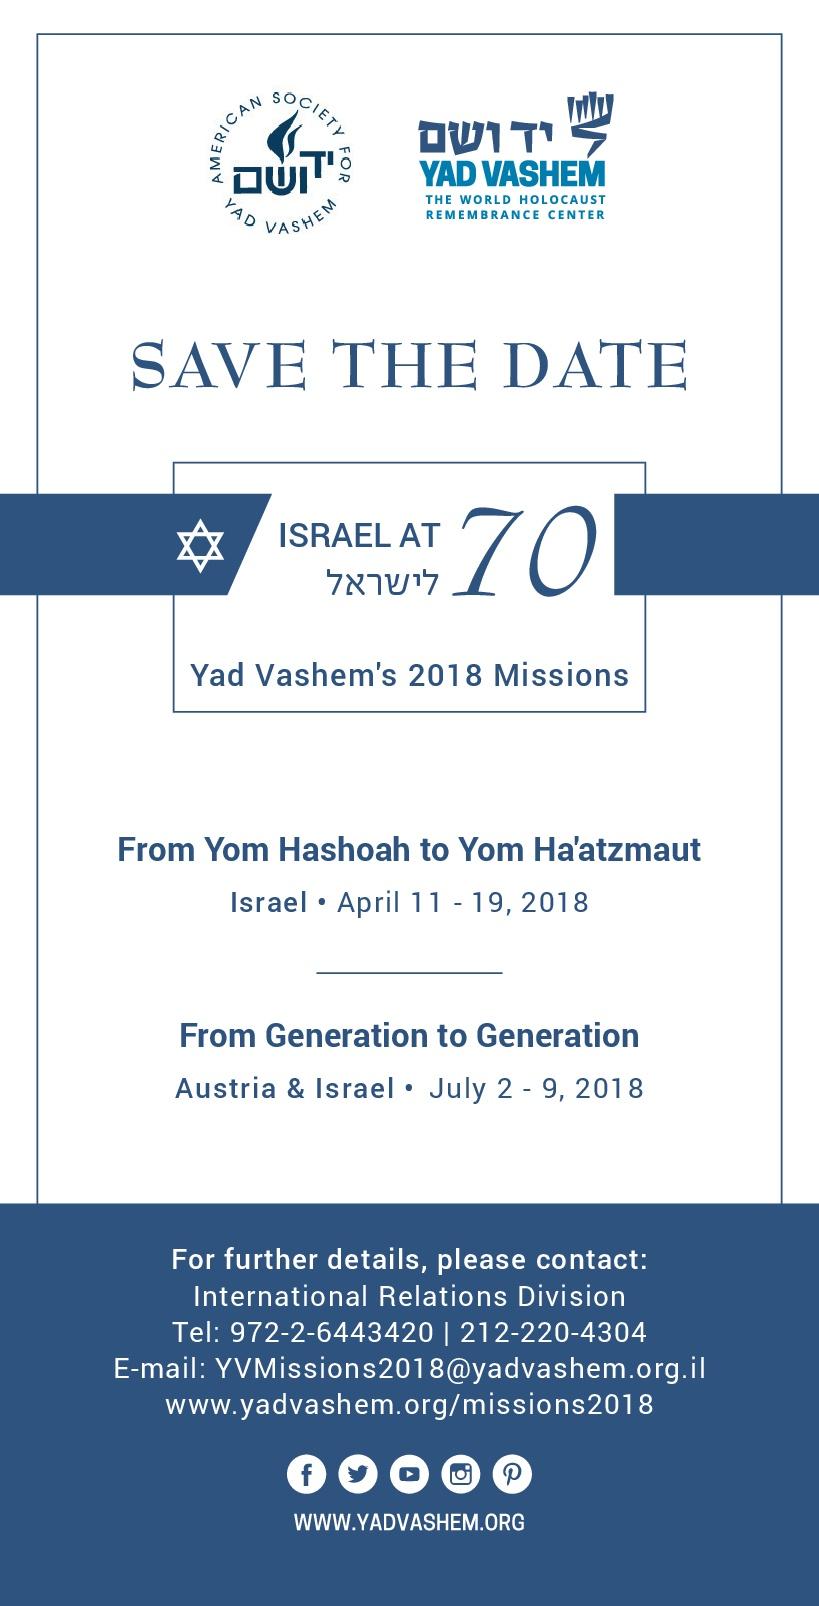 2018-mission-std-7-27-17